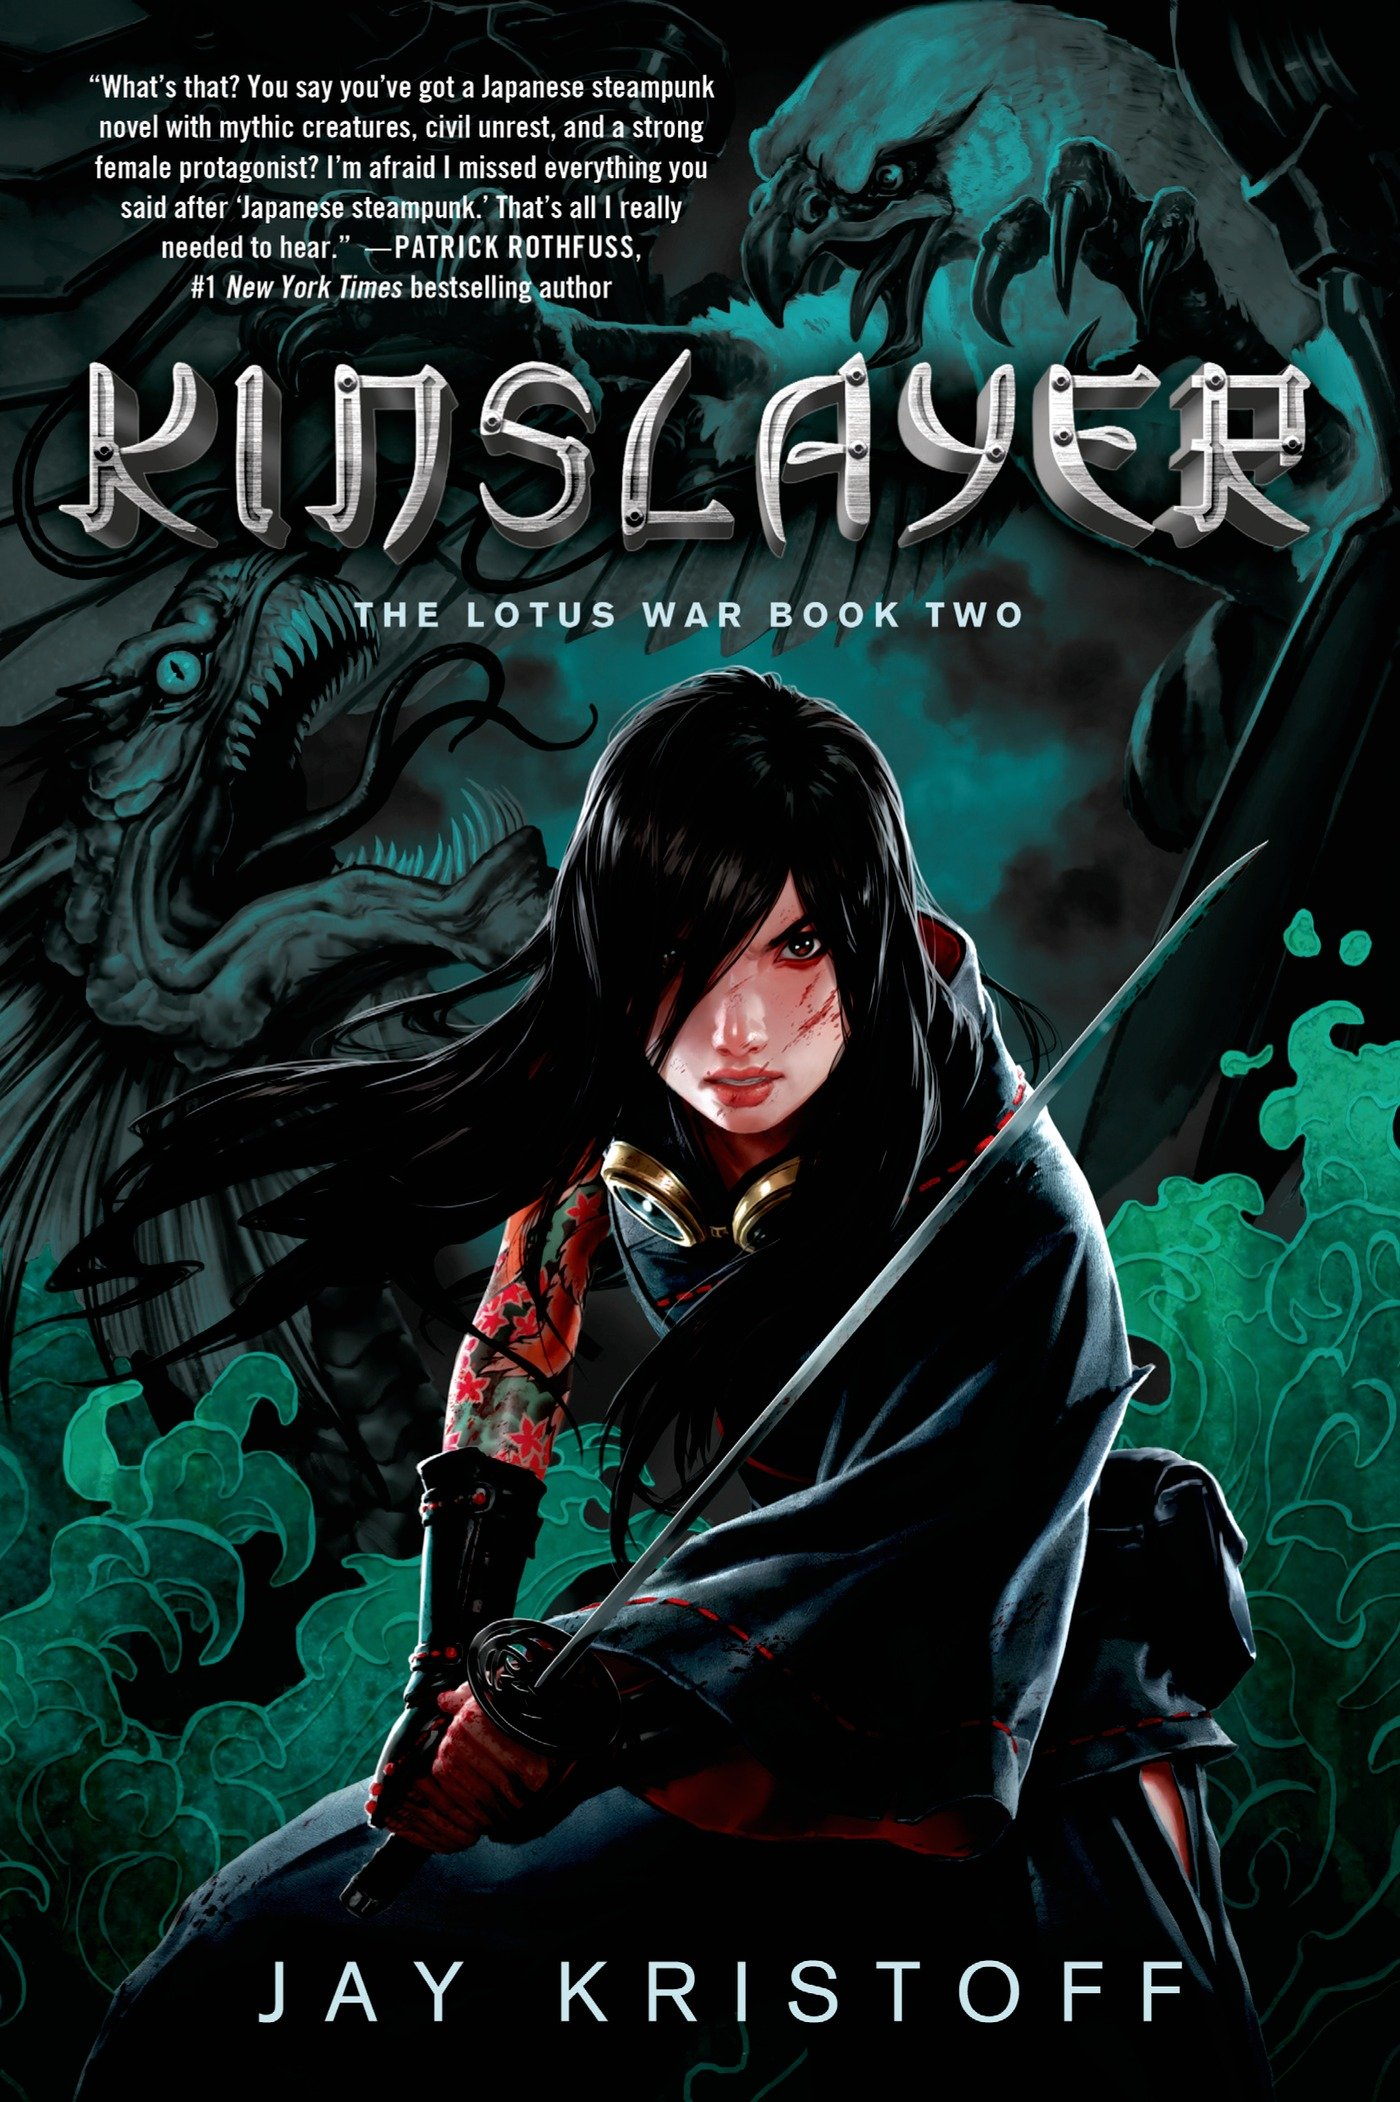 Image result for kinslayer book cover